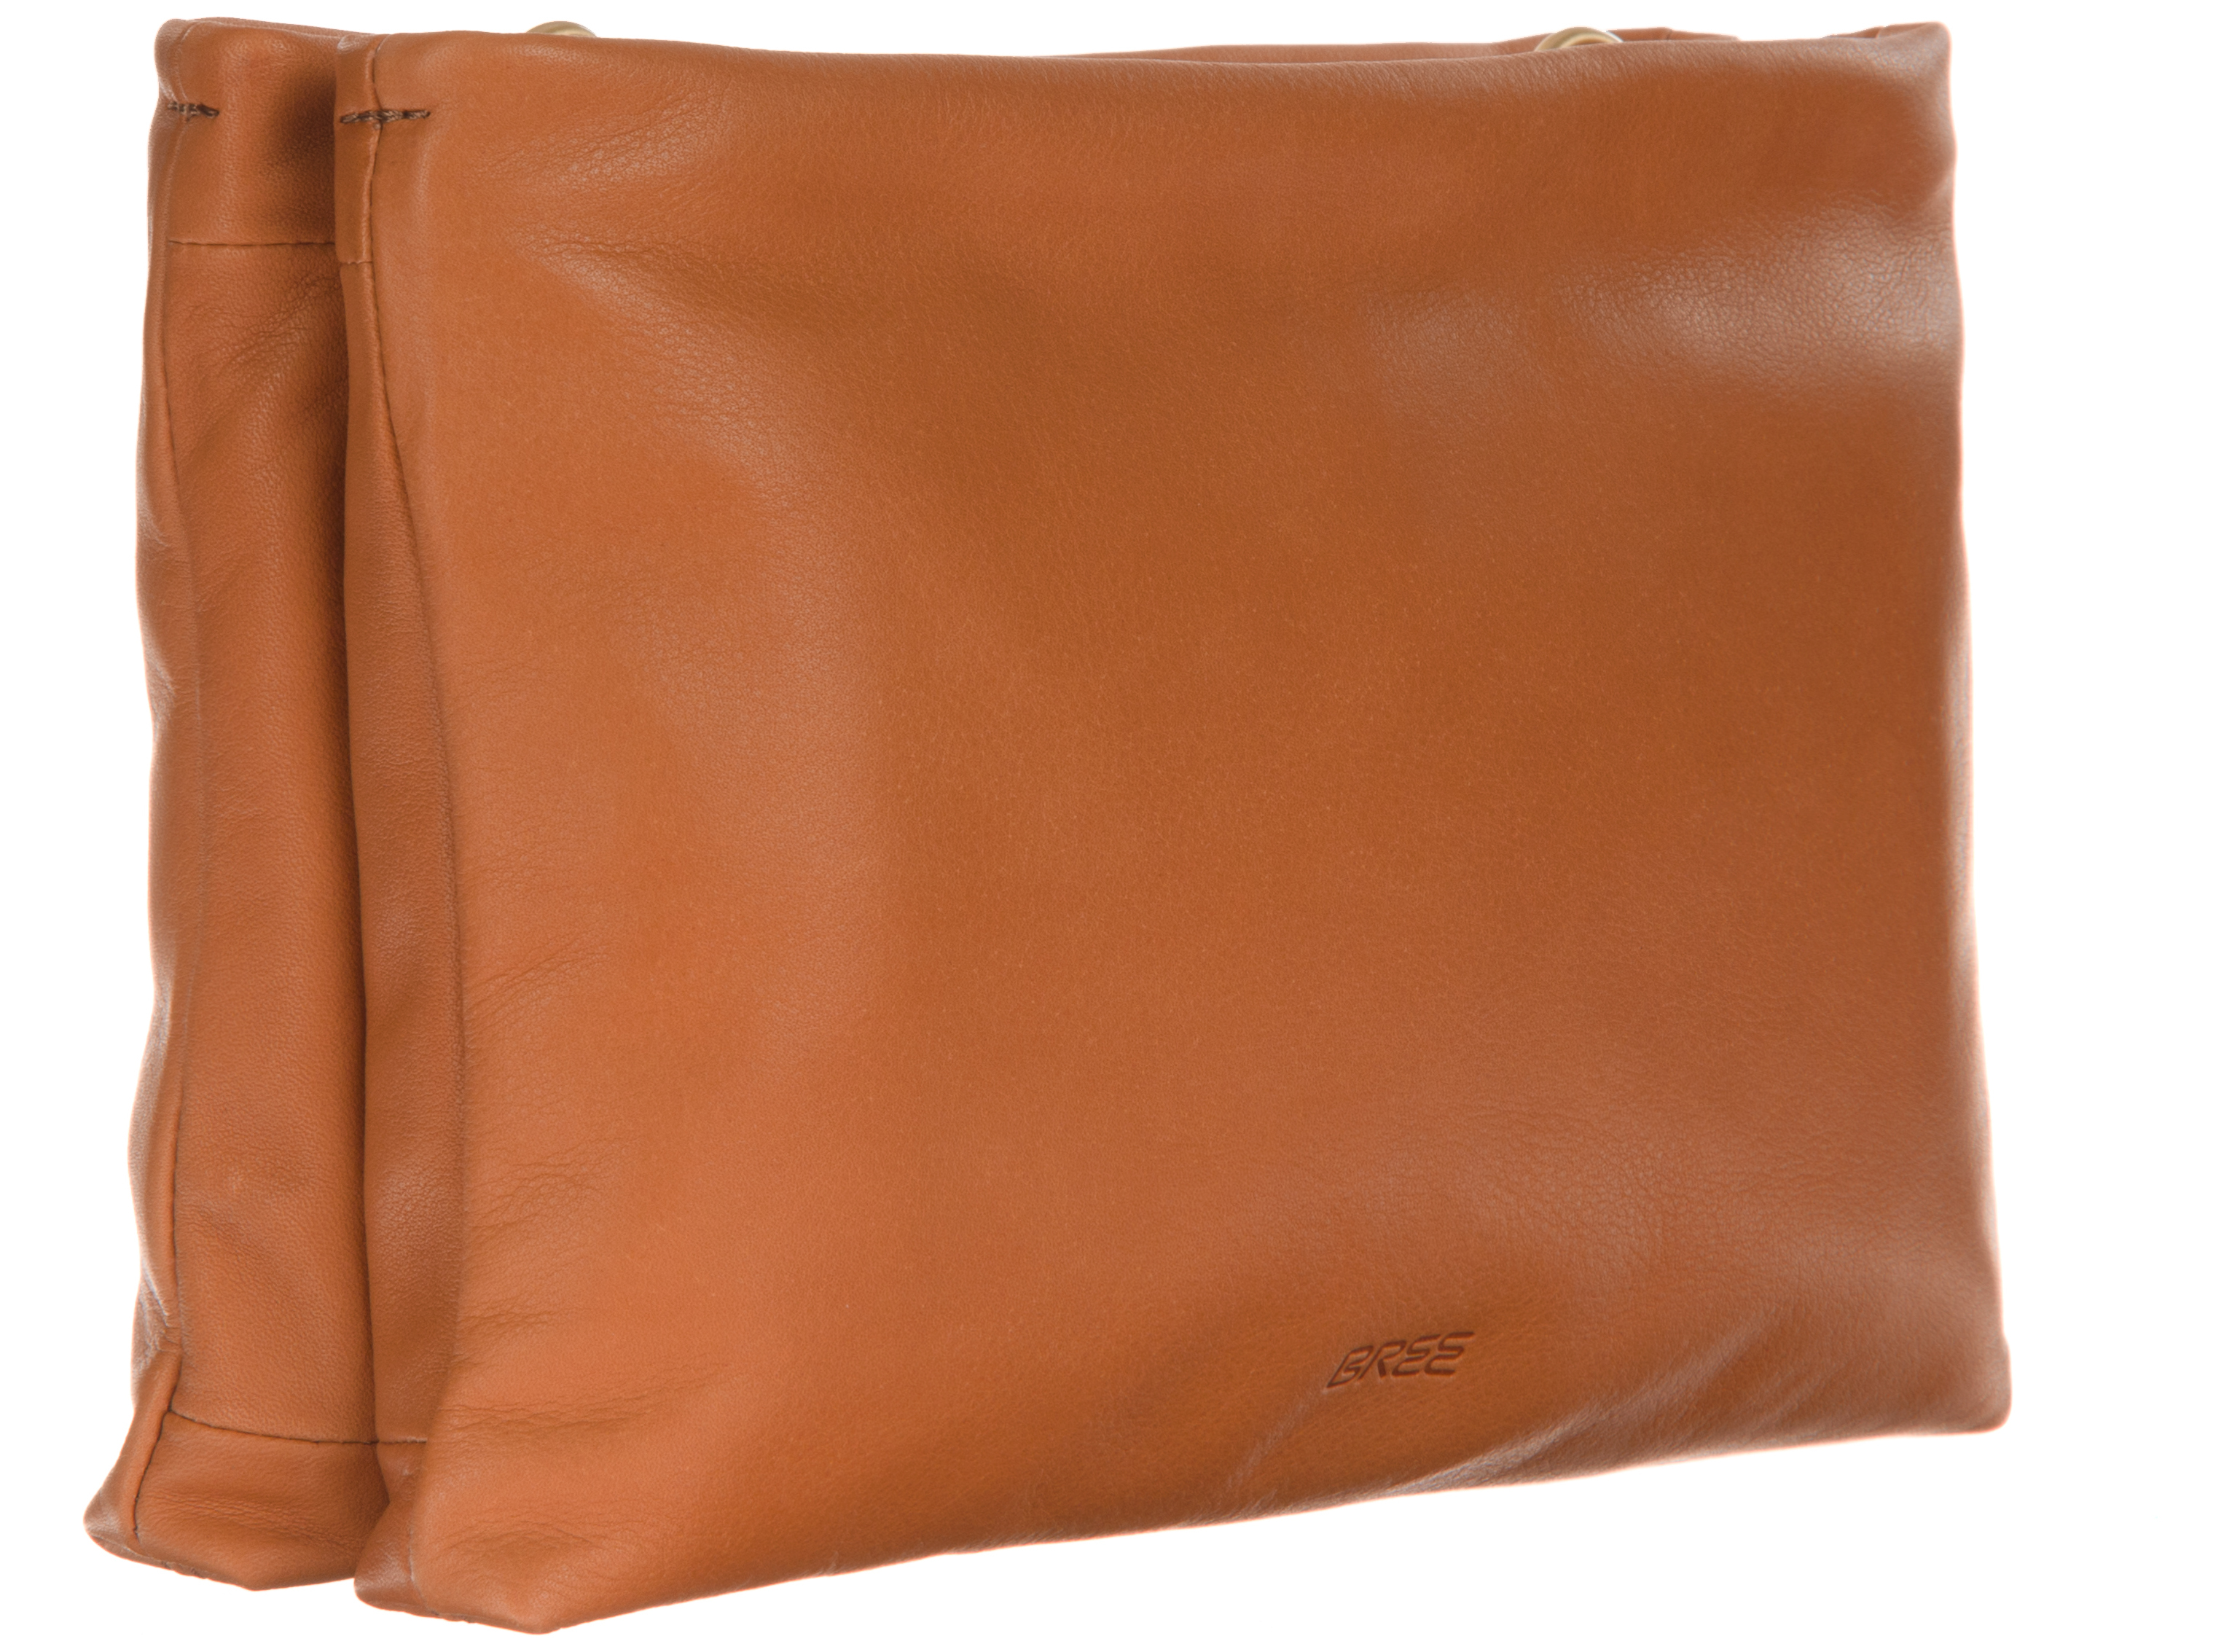 best prices discount shop classic styles Bree Stockholm 46 torbica za čez ramo 184830046 Rjava ...